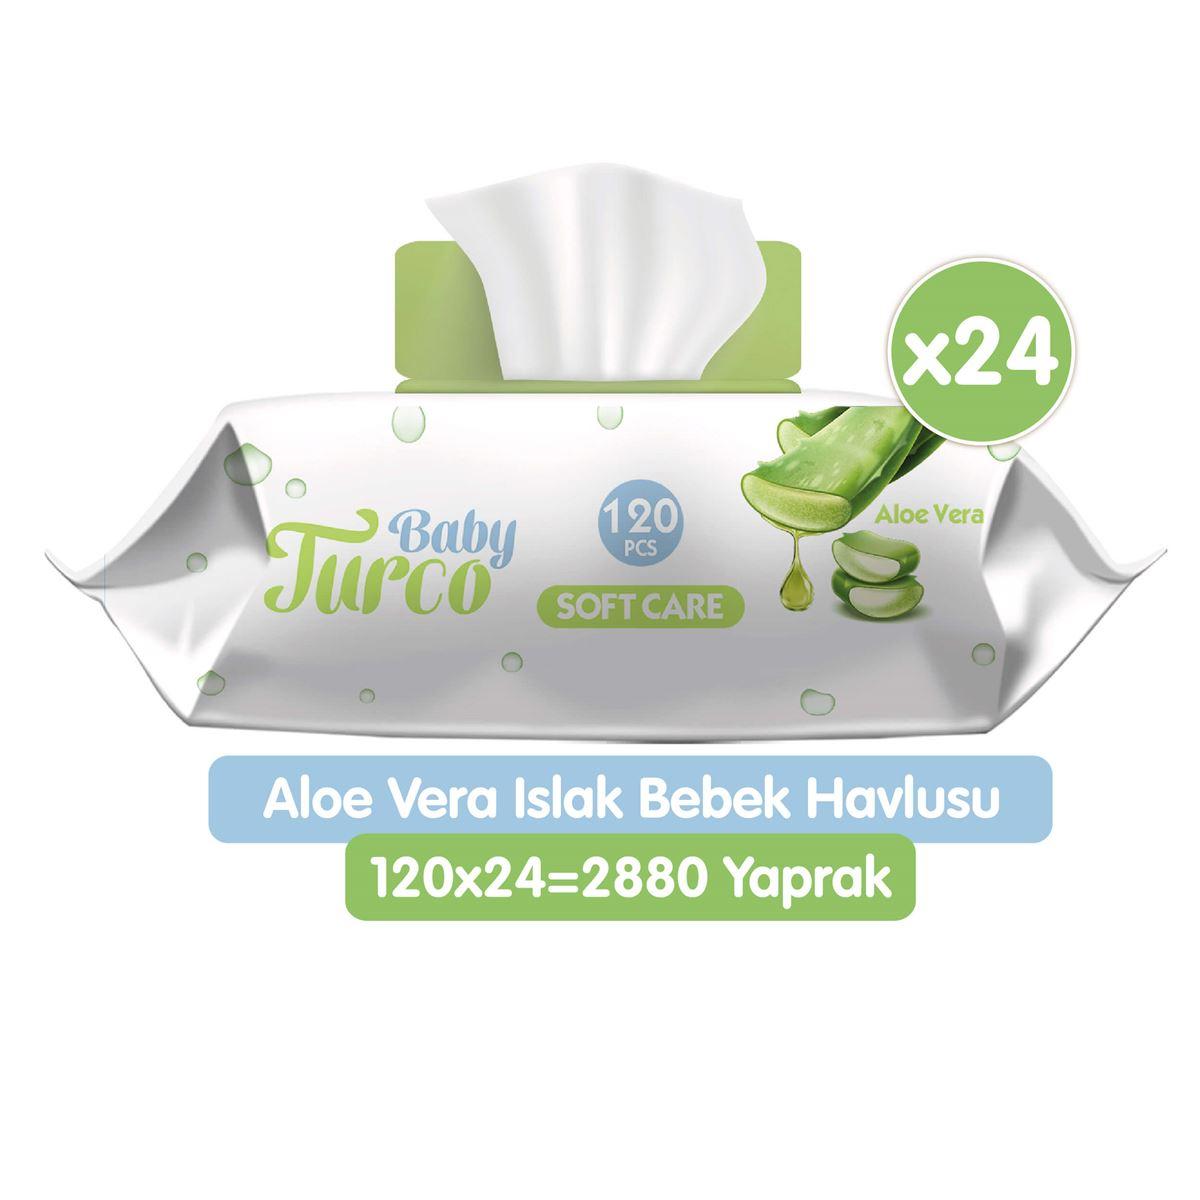 Baby Turco Softcare Aloe Vera Islak Bebek Havlusu 24x120 Adet